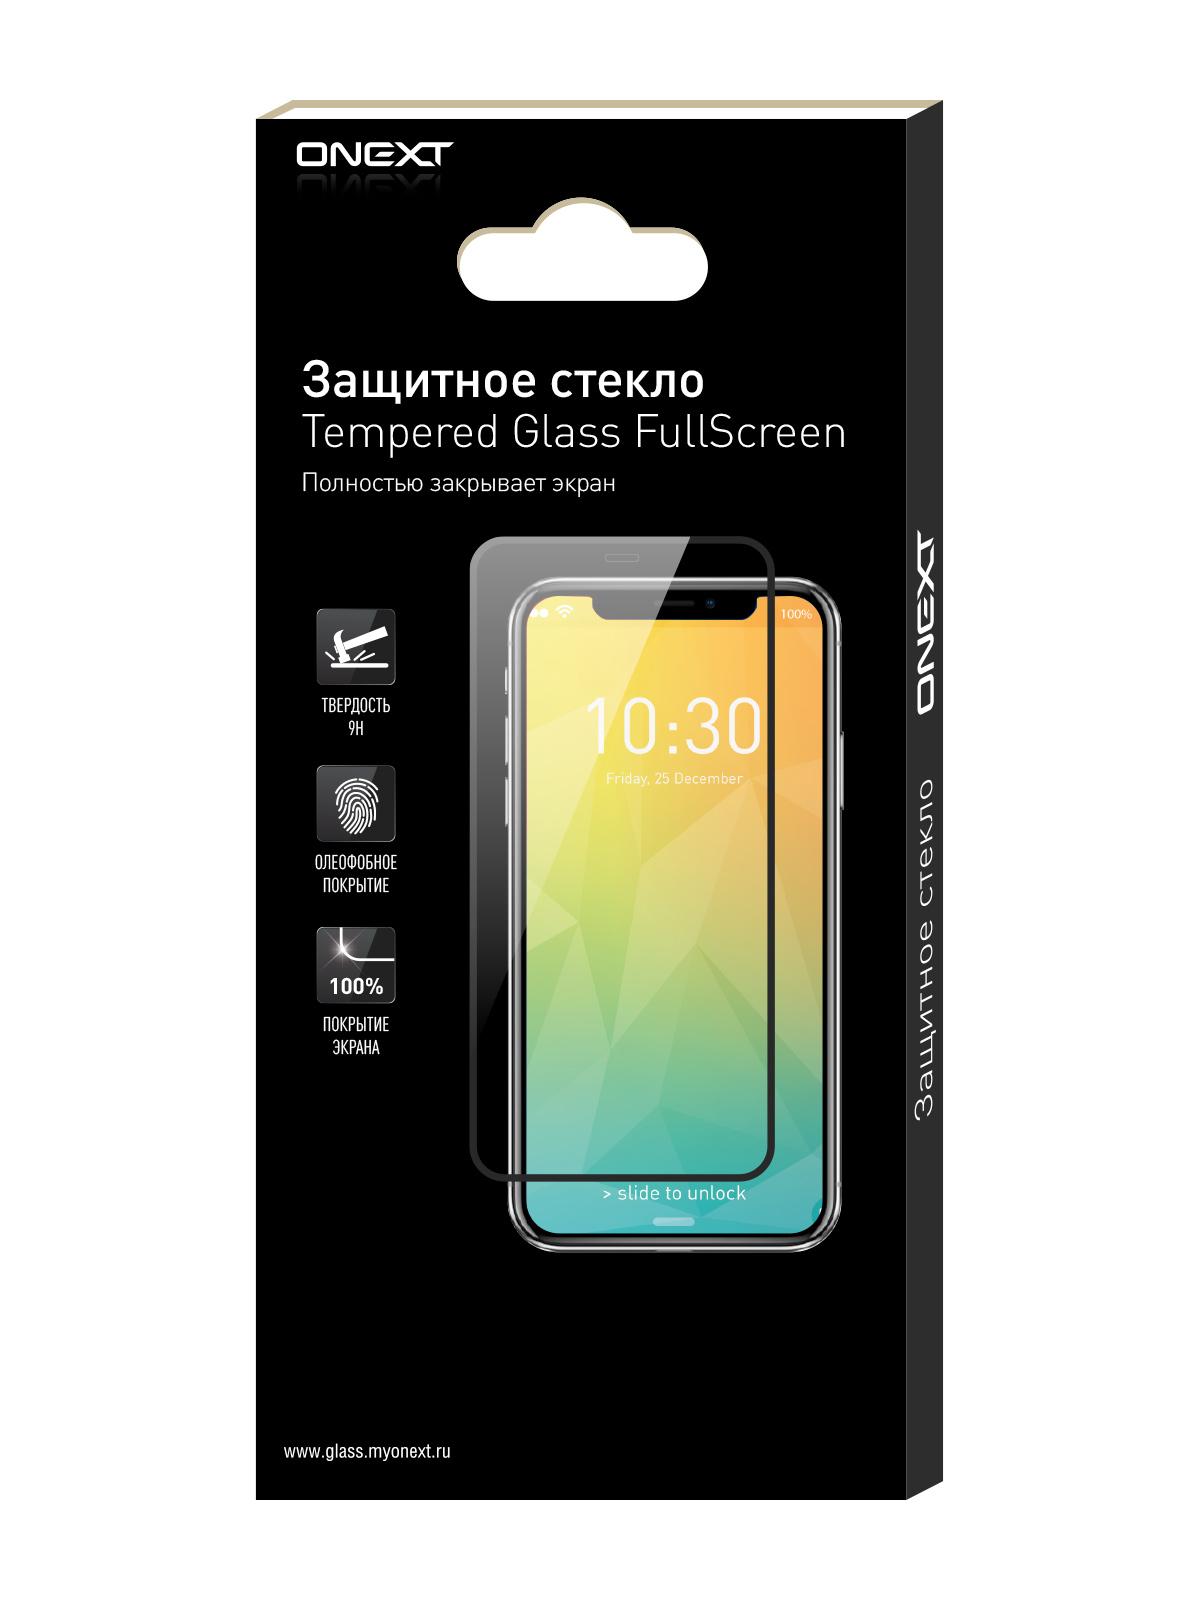 Защитное стекло ONEXT для Samsung Galaxy A5 (2017) White